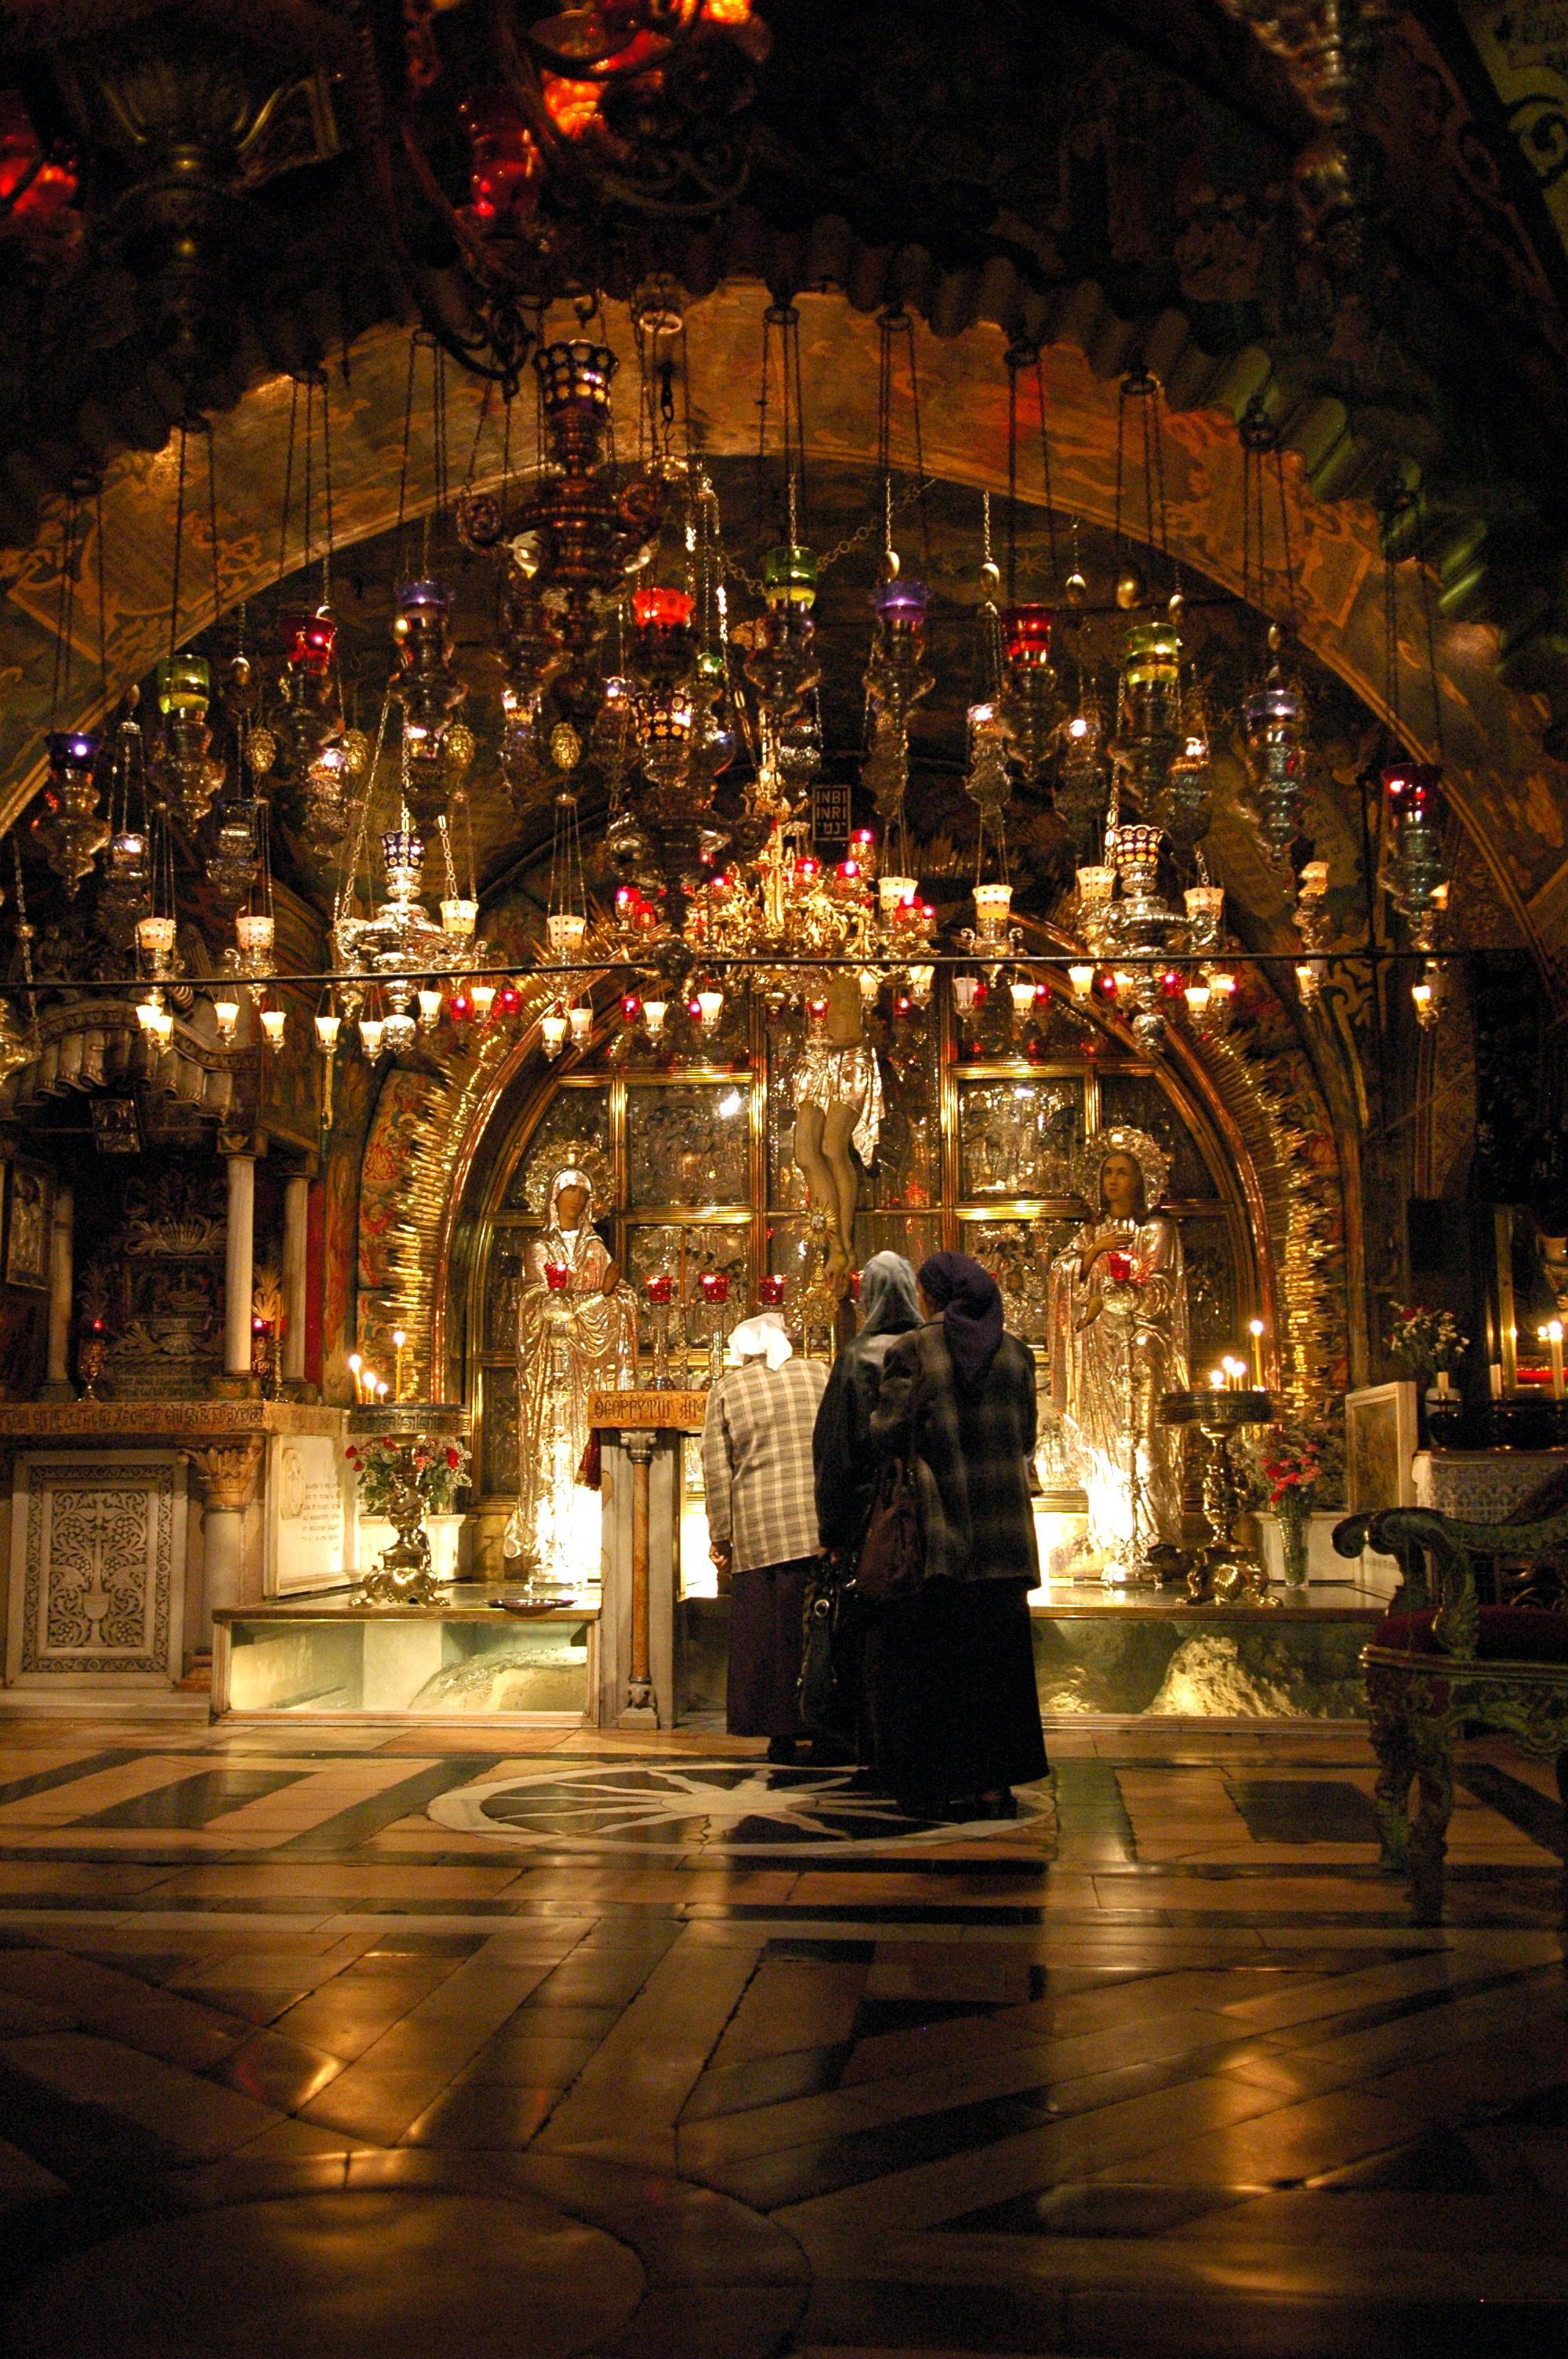 Golgotha_(Church_of_the_Holy_Sepulchre).jpg